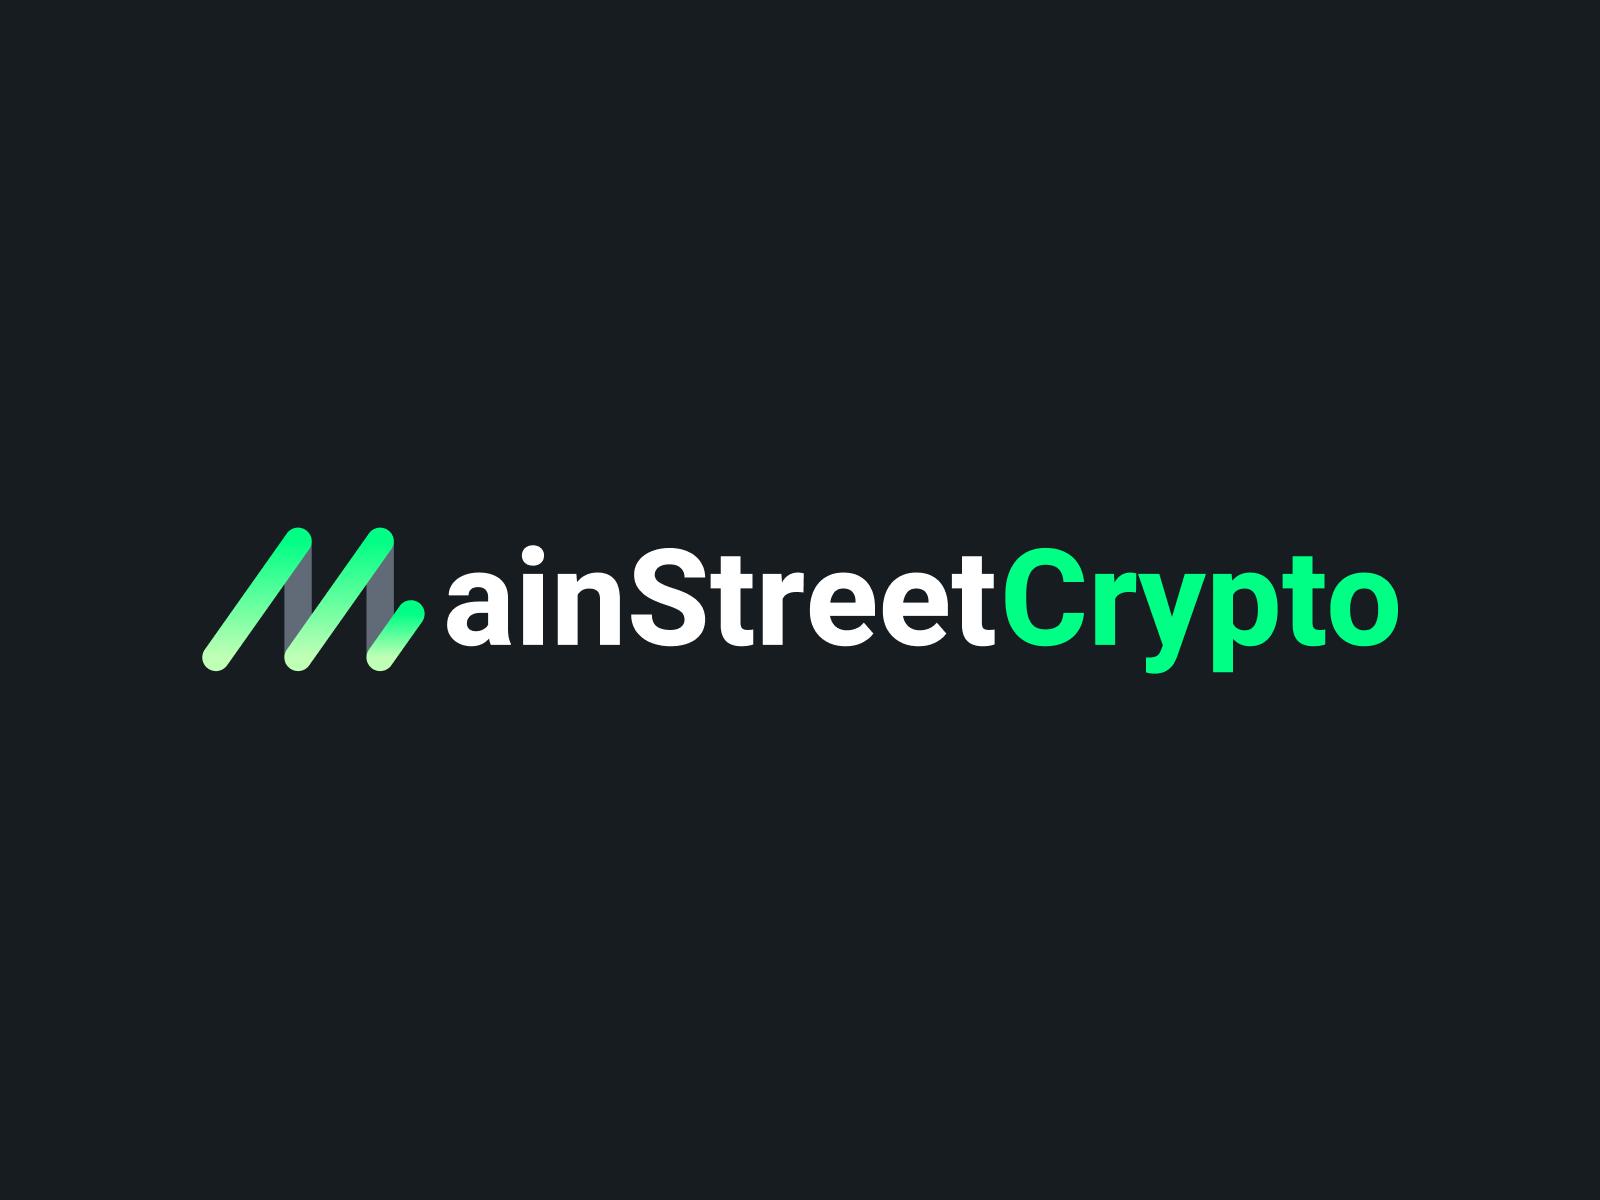 mainstreetcrypto__logo_shot.png